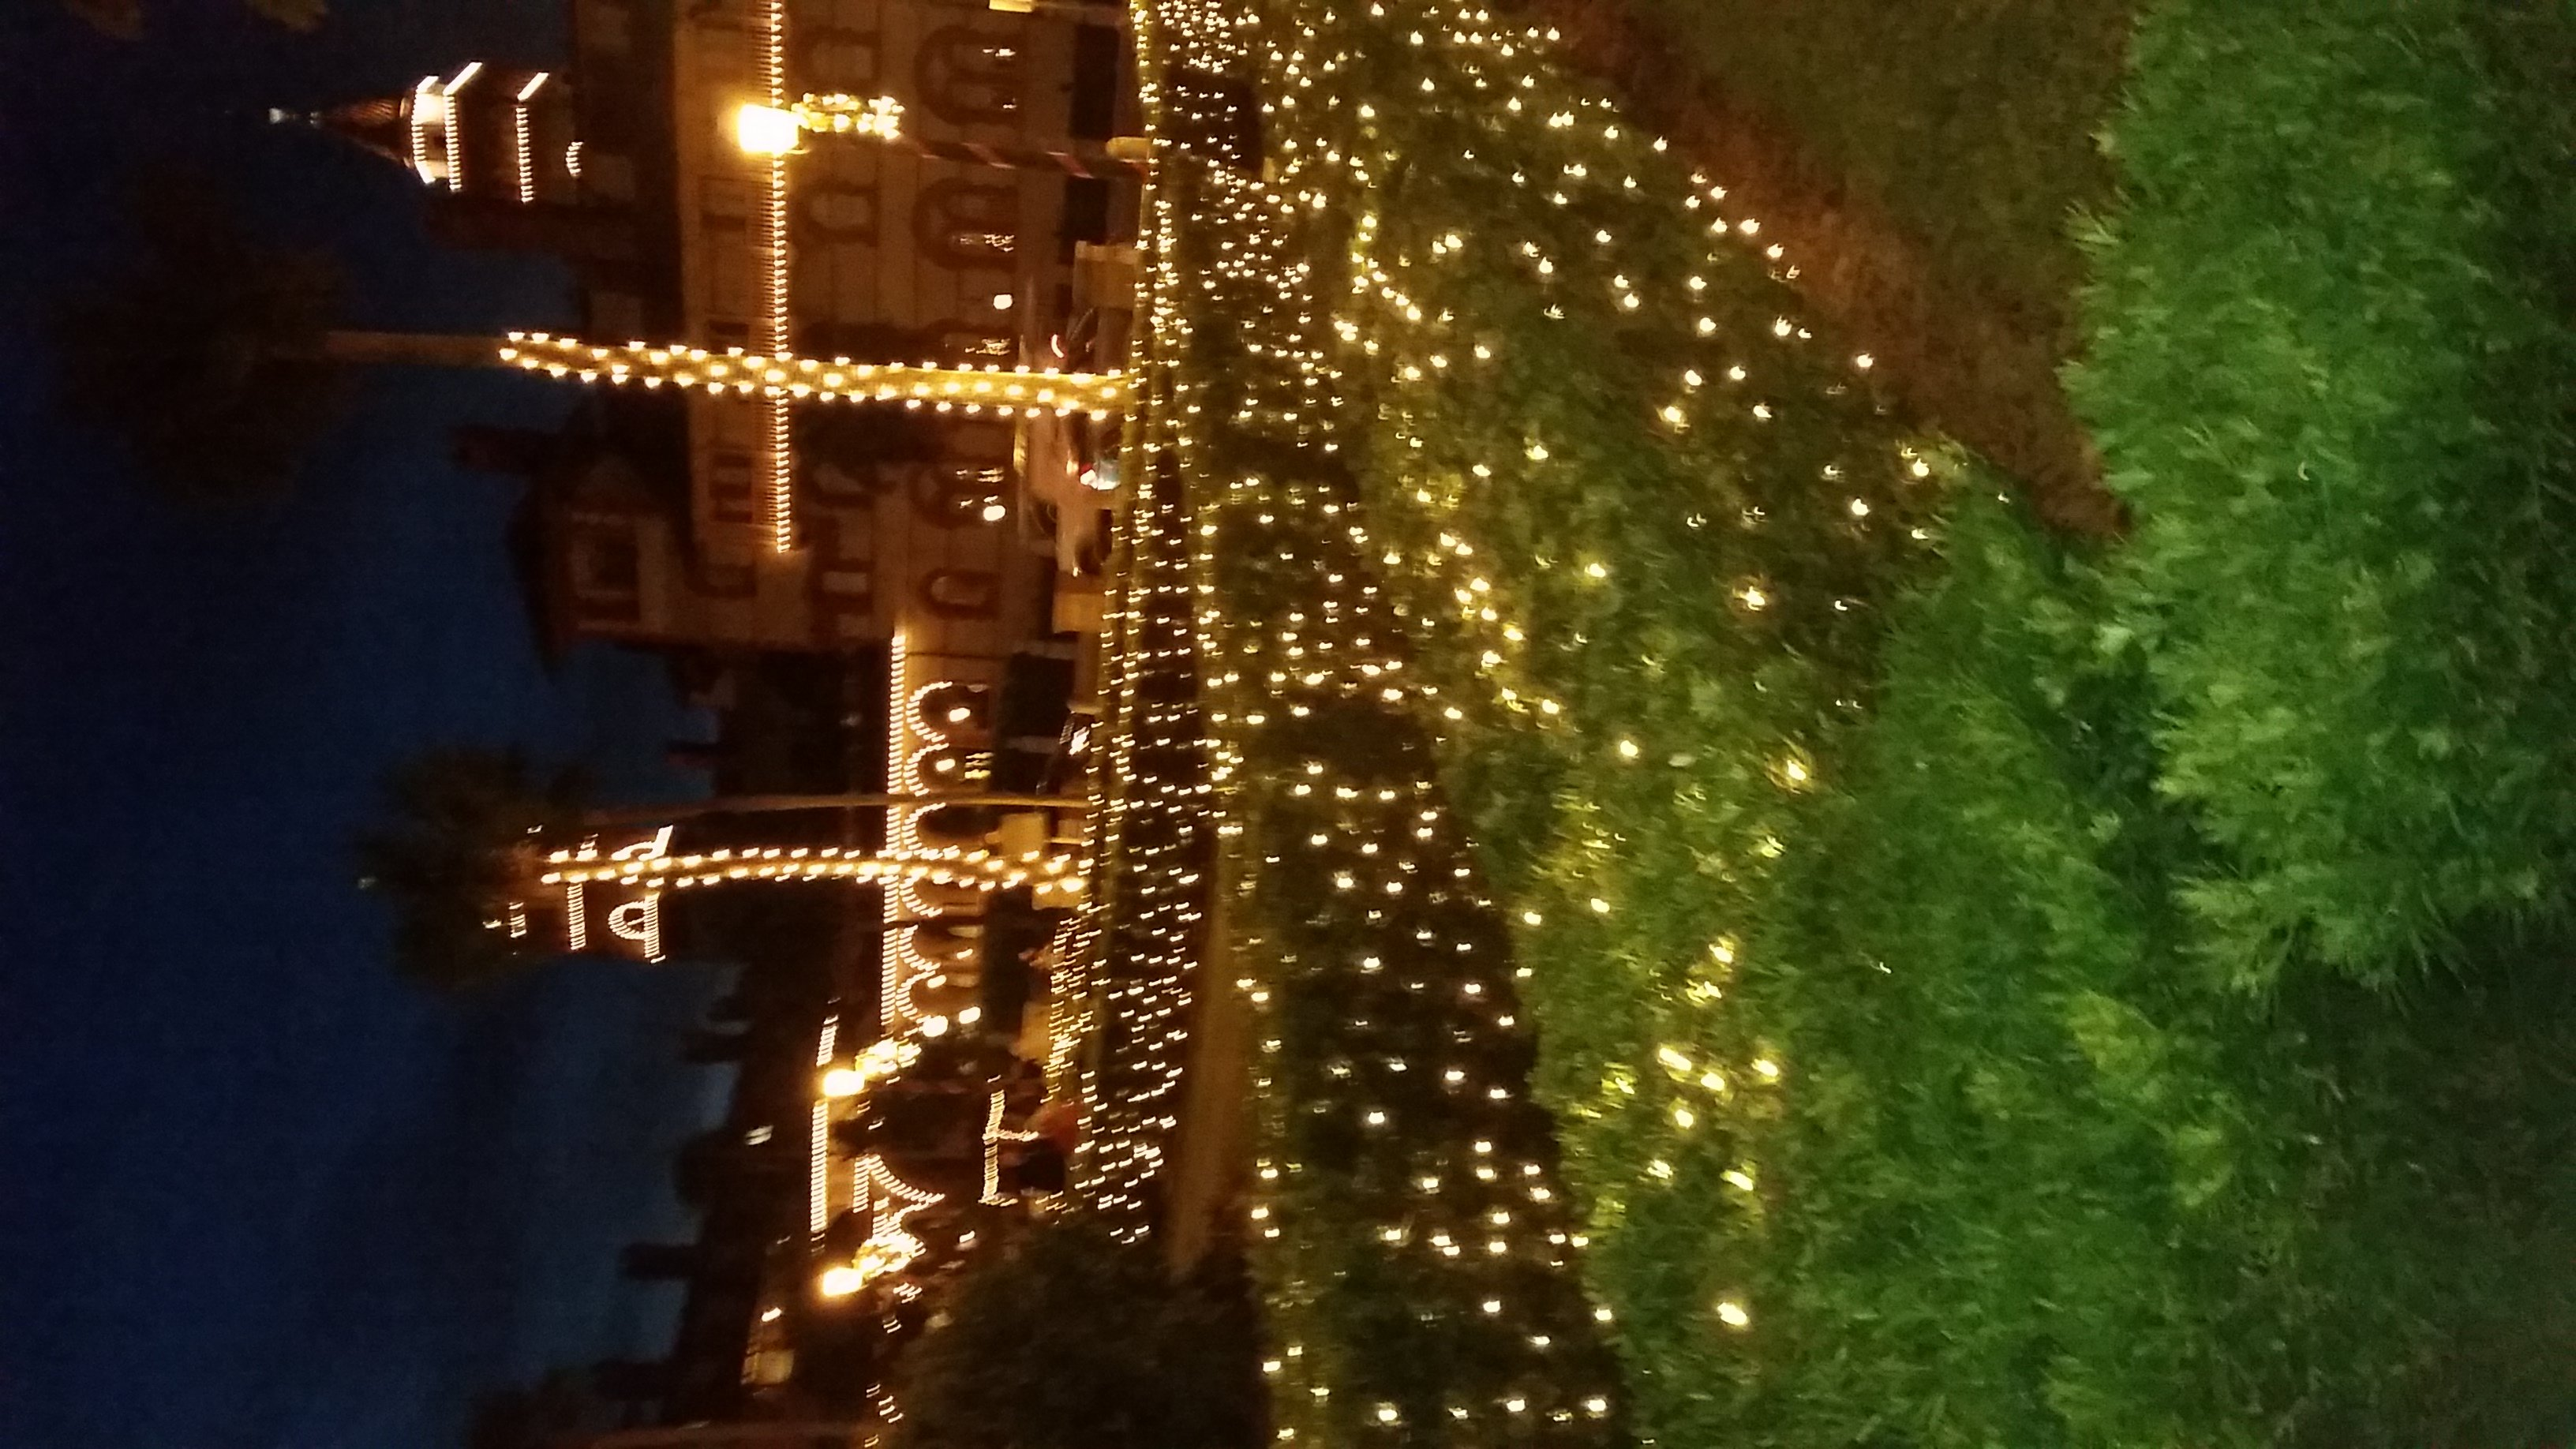 Coty of 1000000 lights